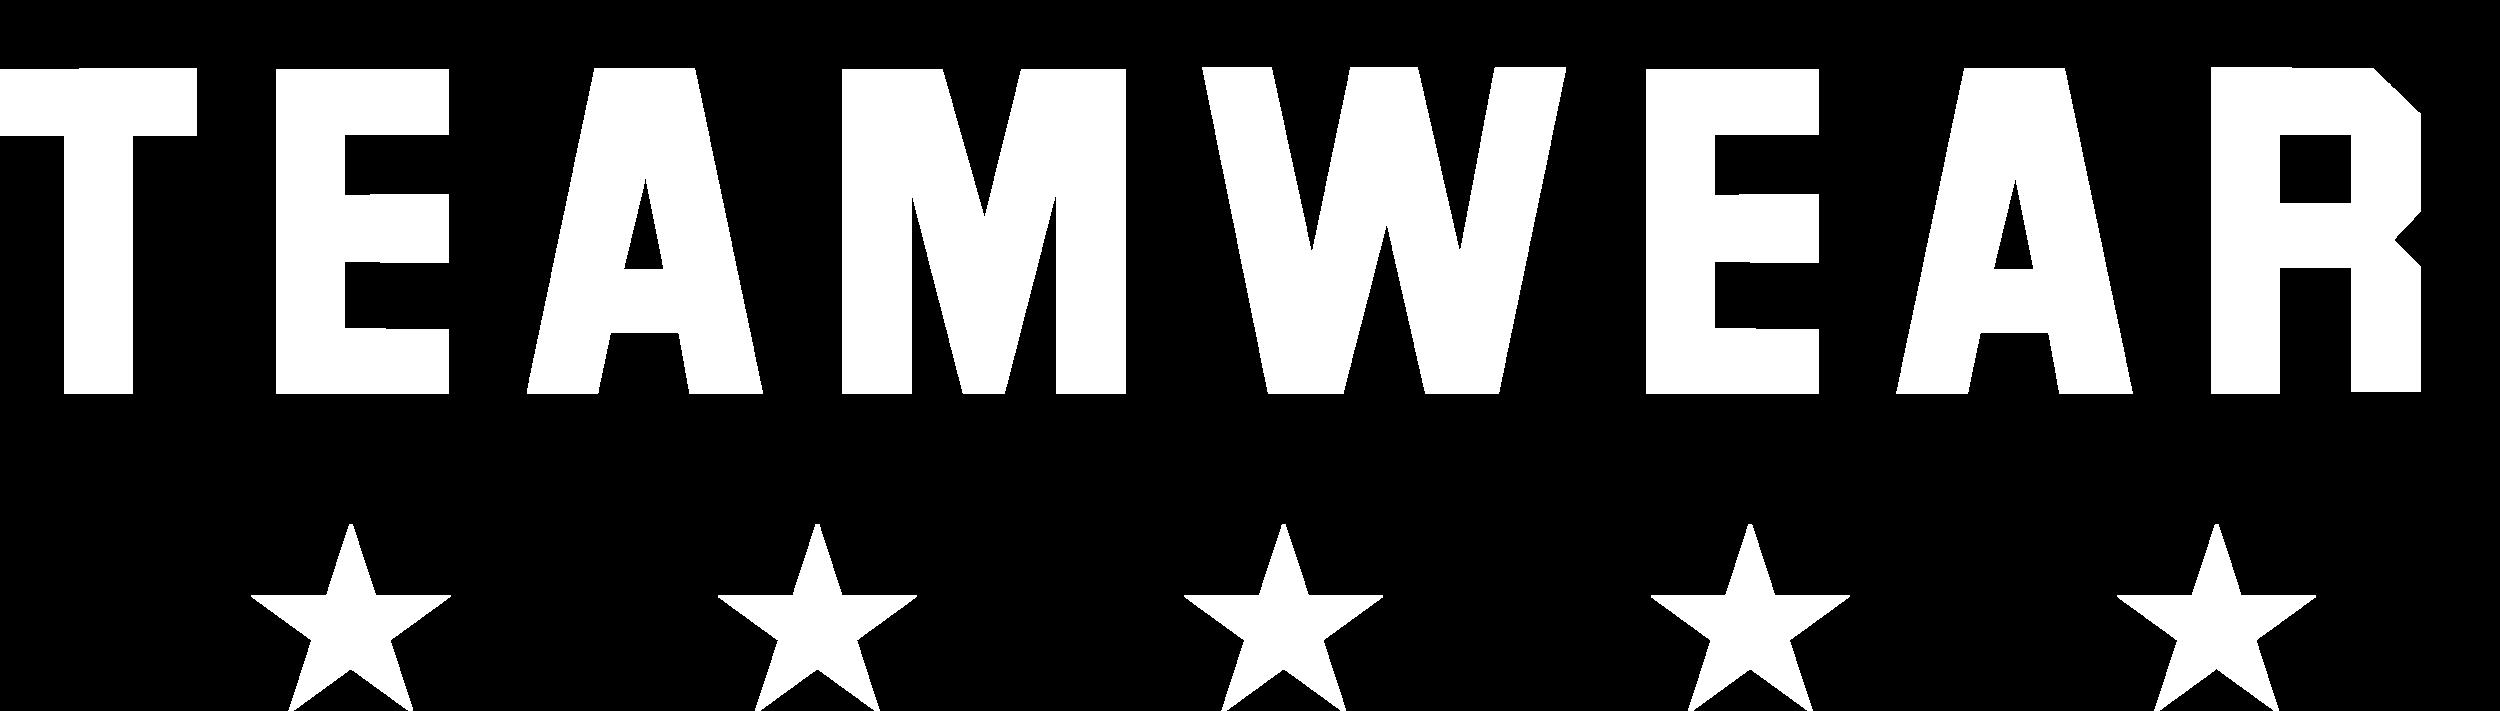 Teamwear_White.png